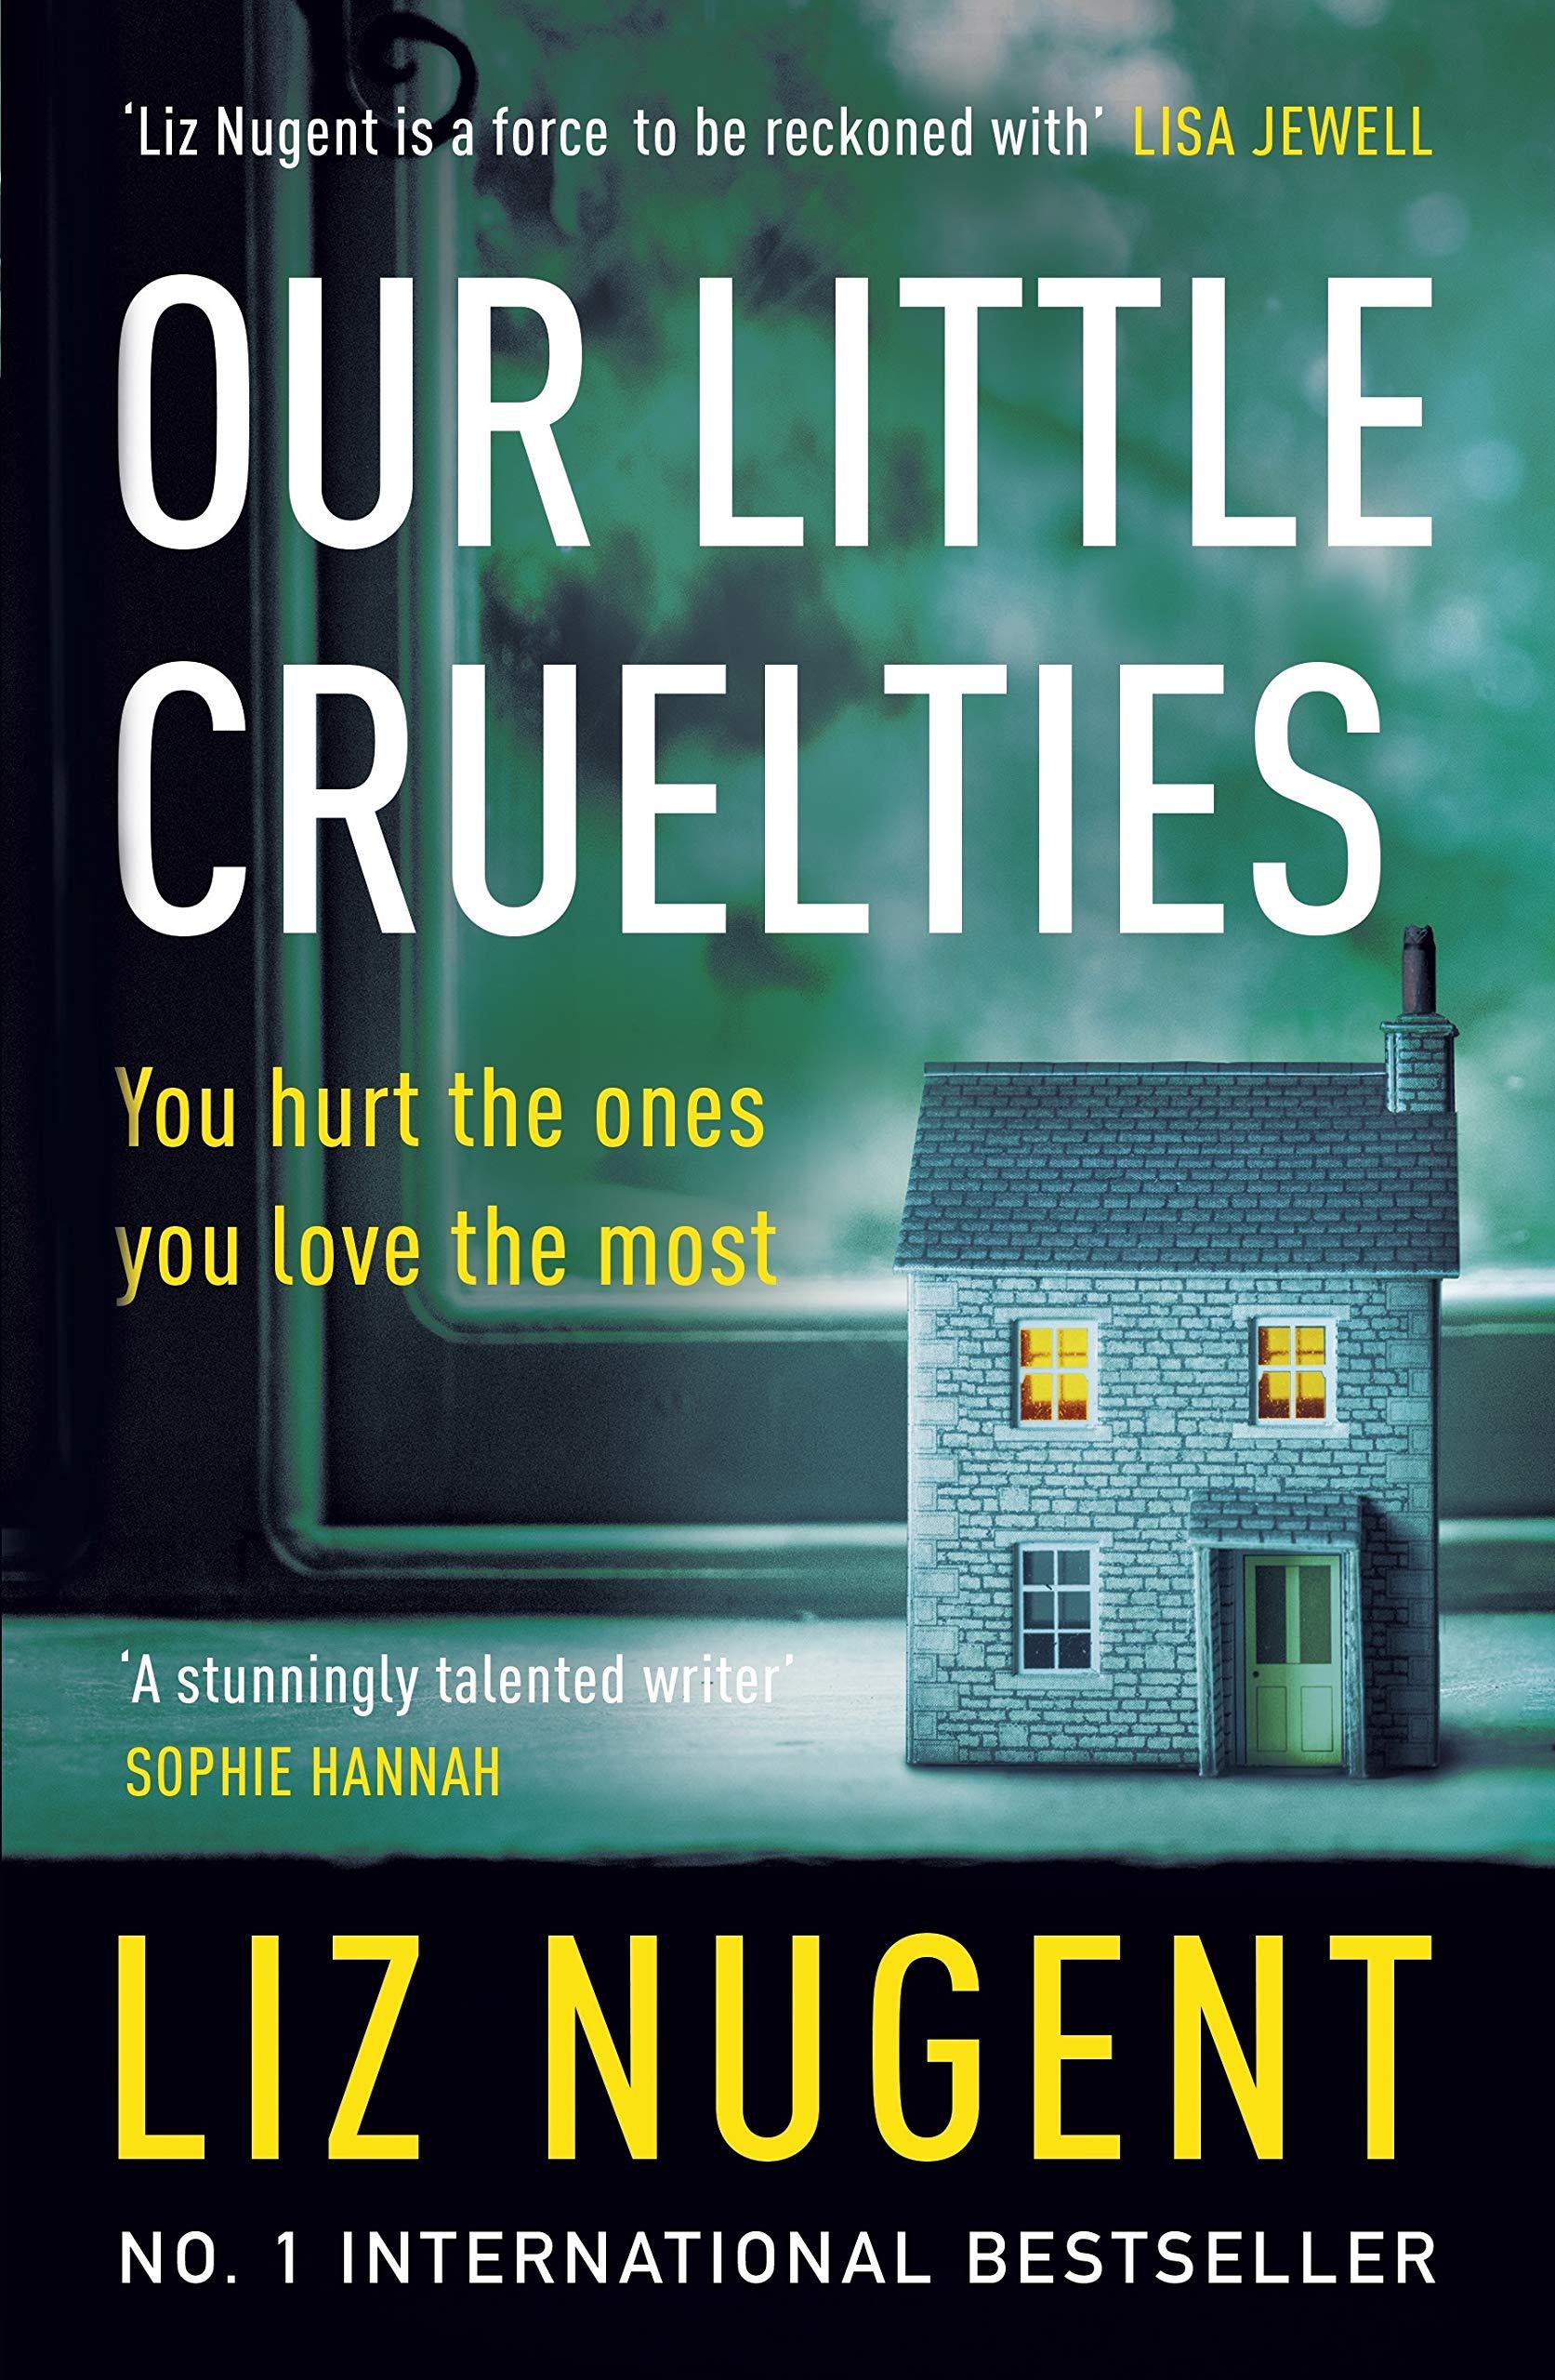 Our Little Cruelties | Liz Nugent | Charlie Byrne's